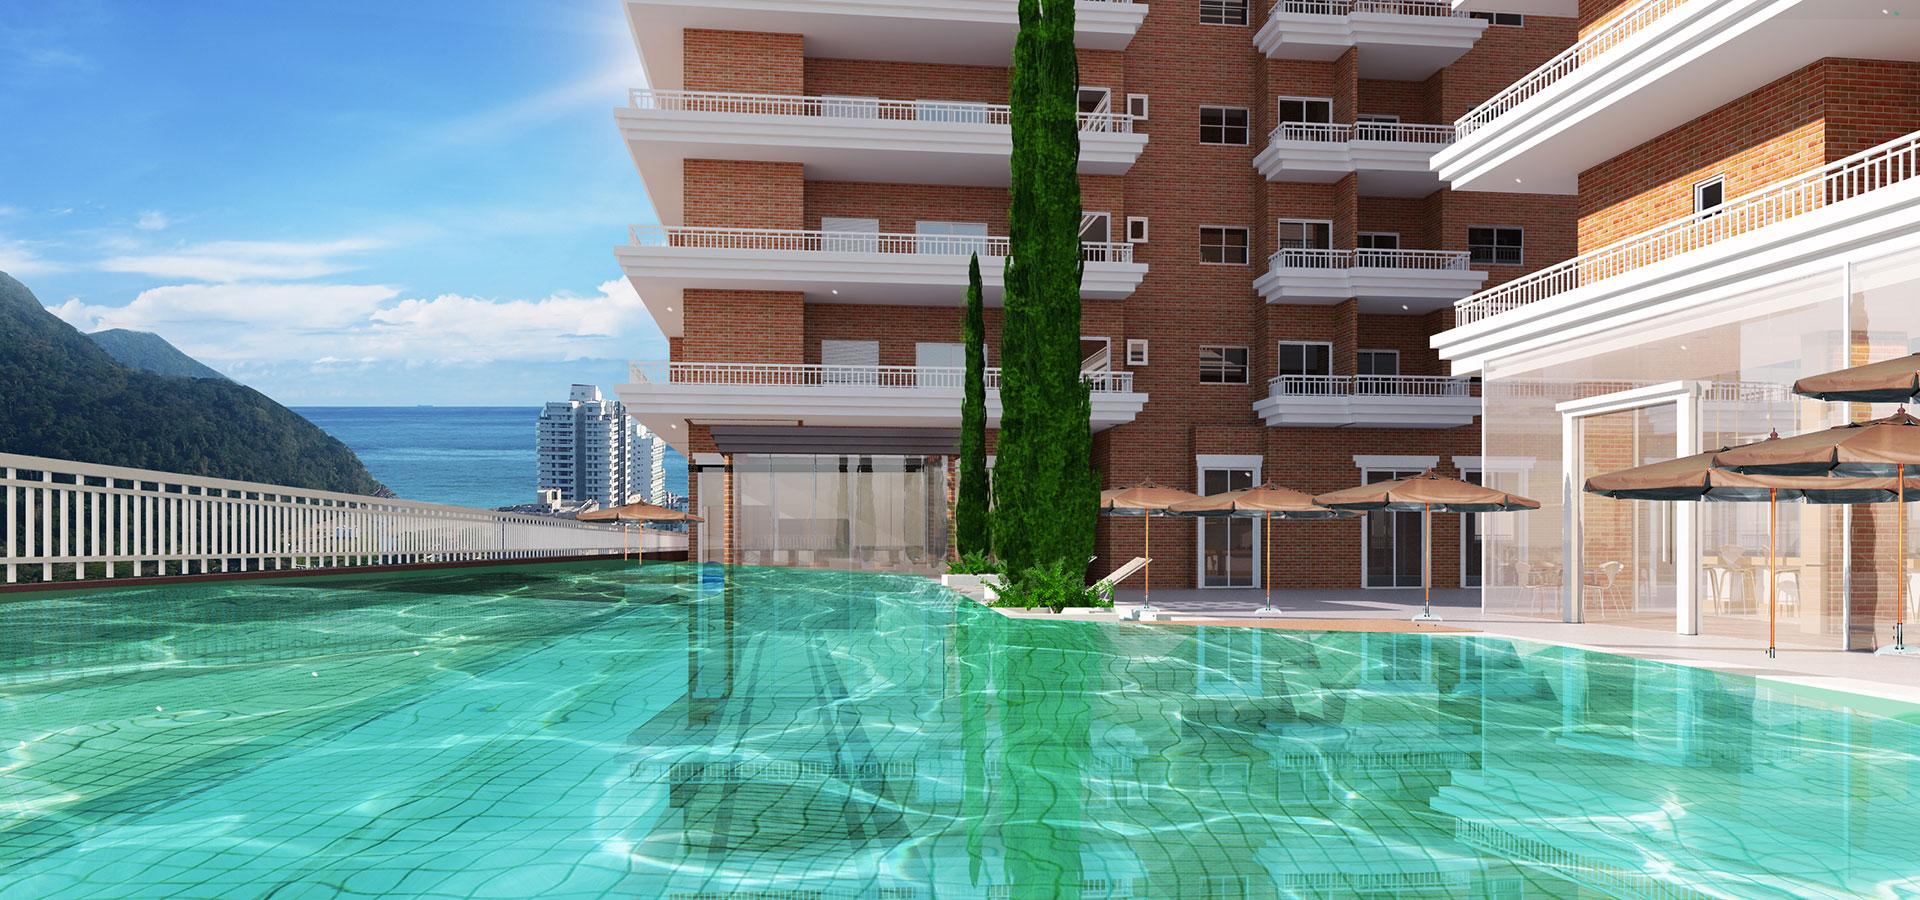 10-piscin-angulo-edit